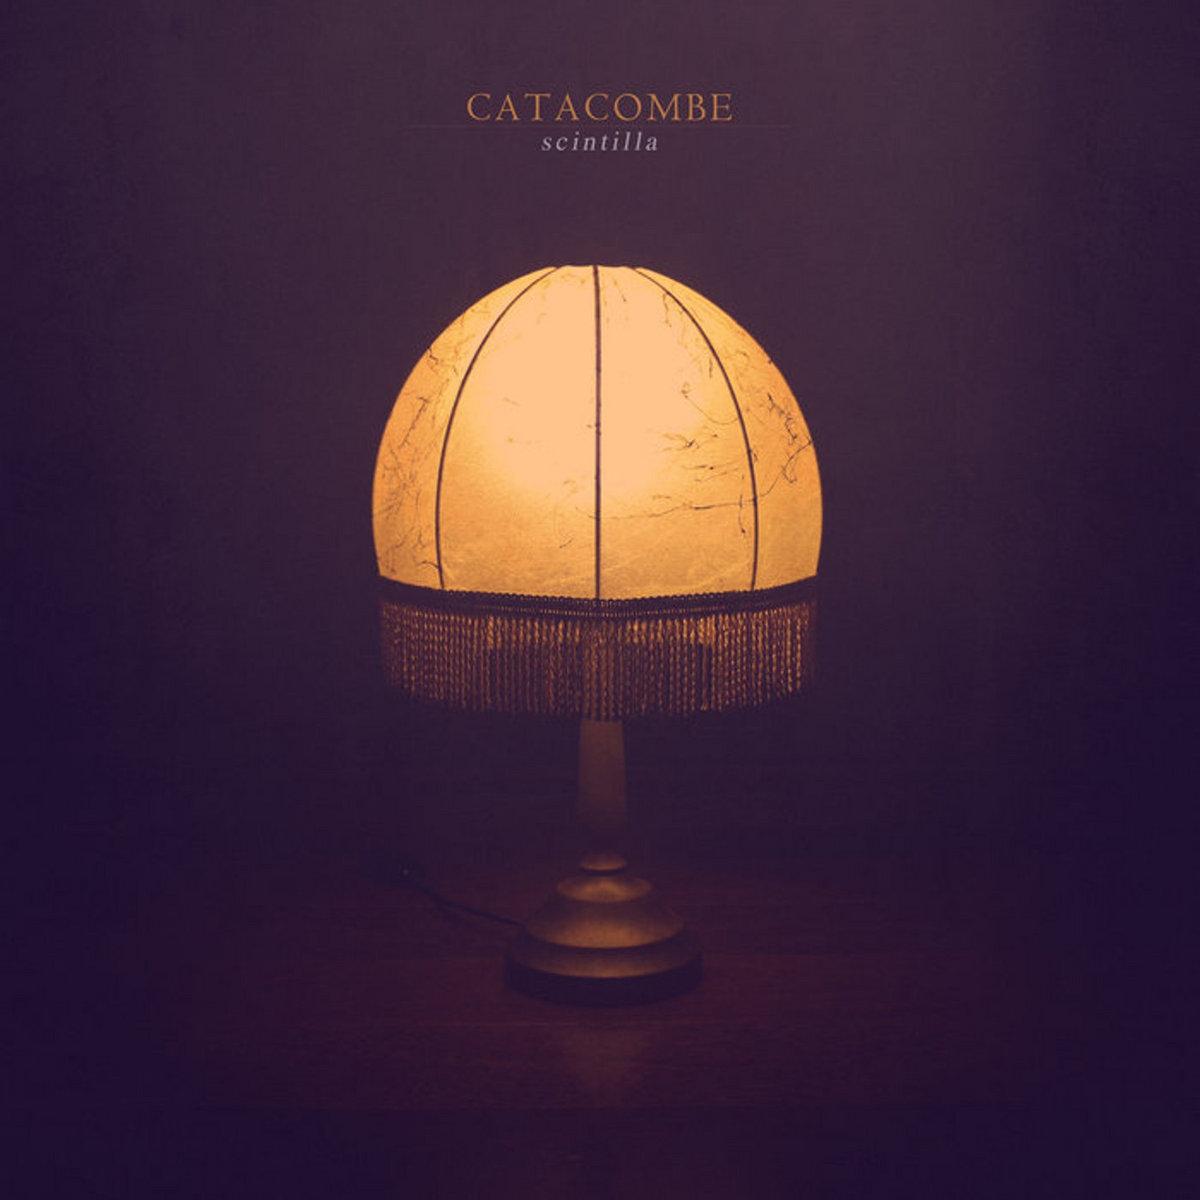 CATACOMBE - Scintilla